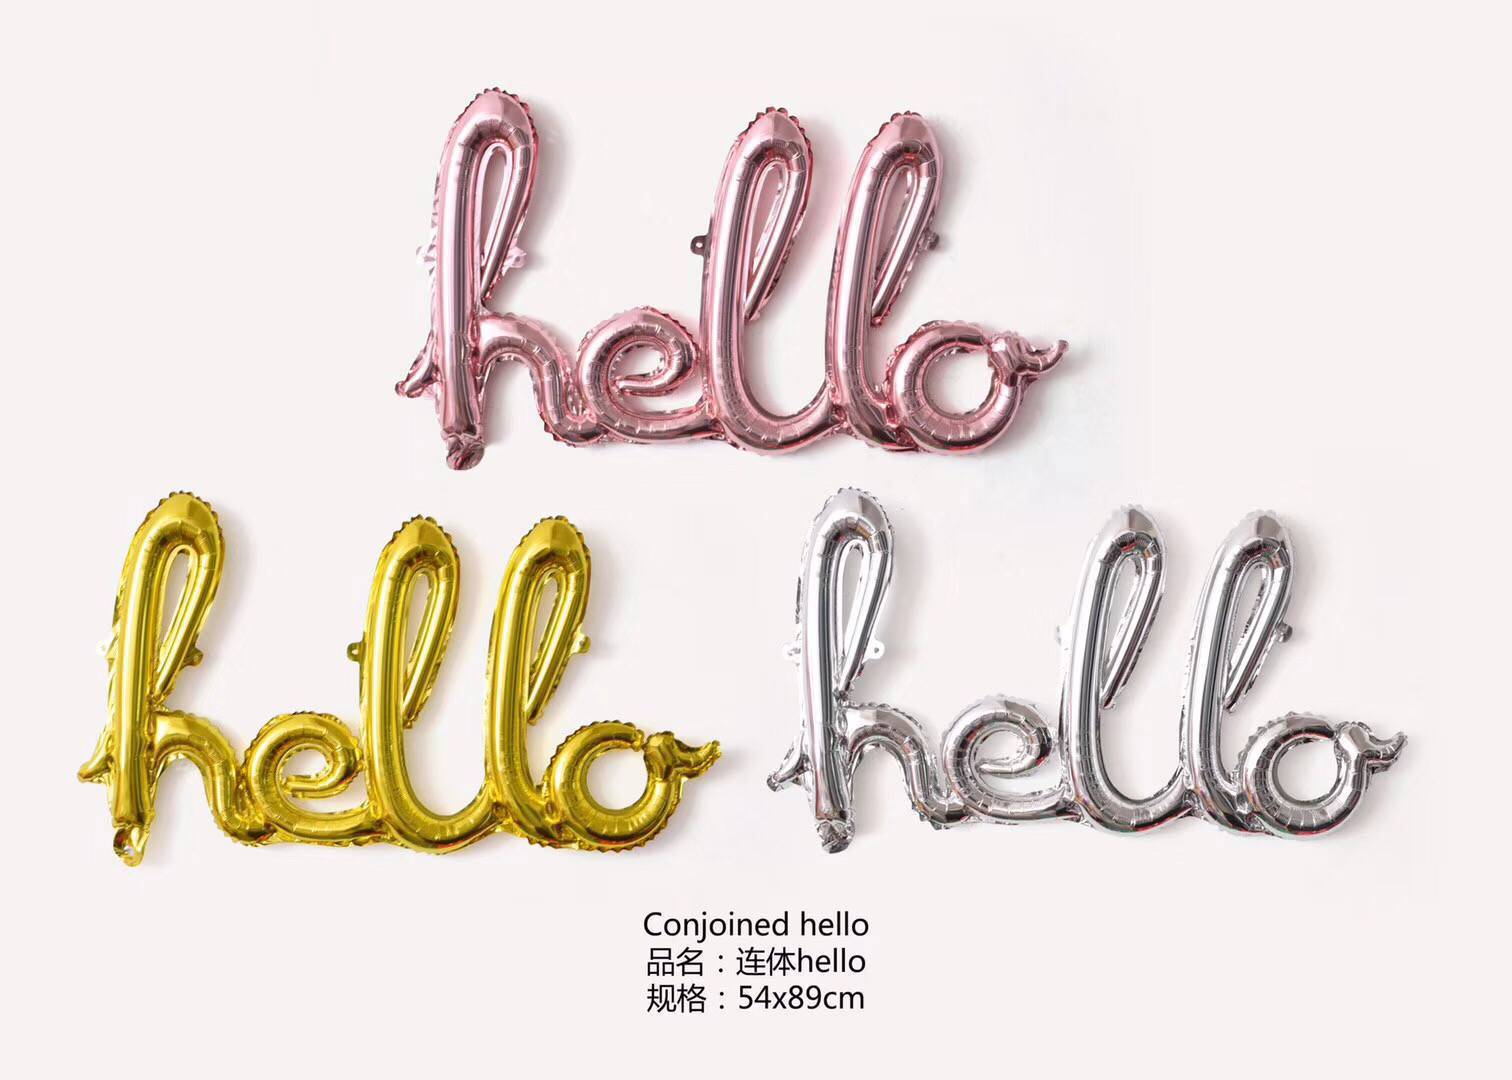 Hot Sales One-piece Handwritten Hello Aluminum Film Balloon Birthday Wedding Christmas Party Venues Decorative Balloon